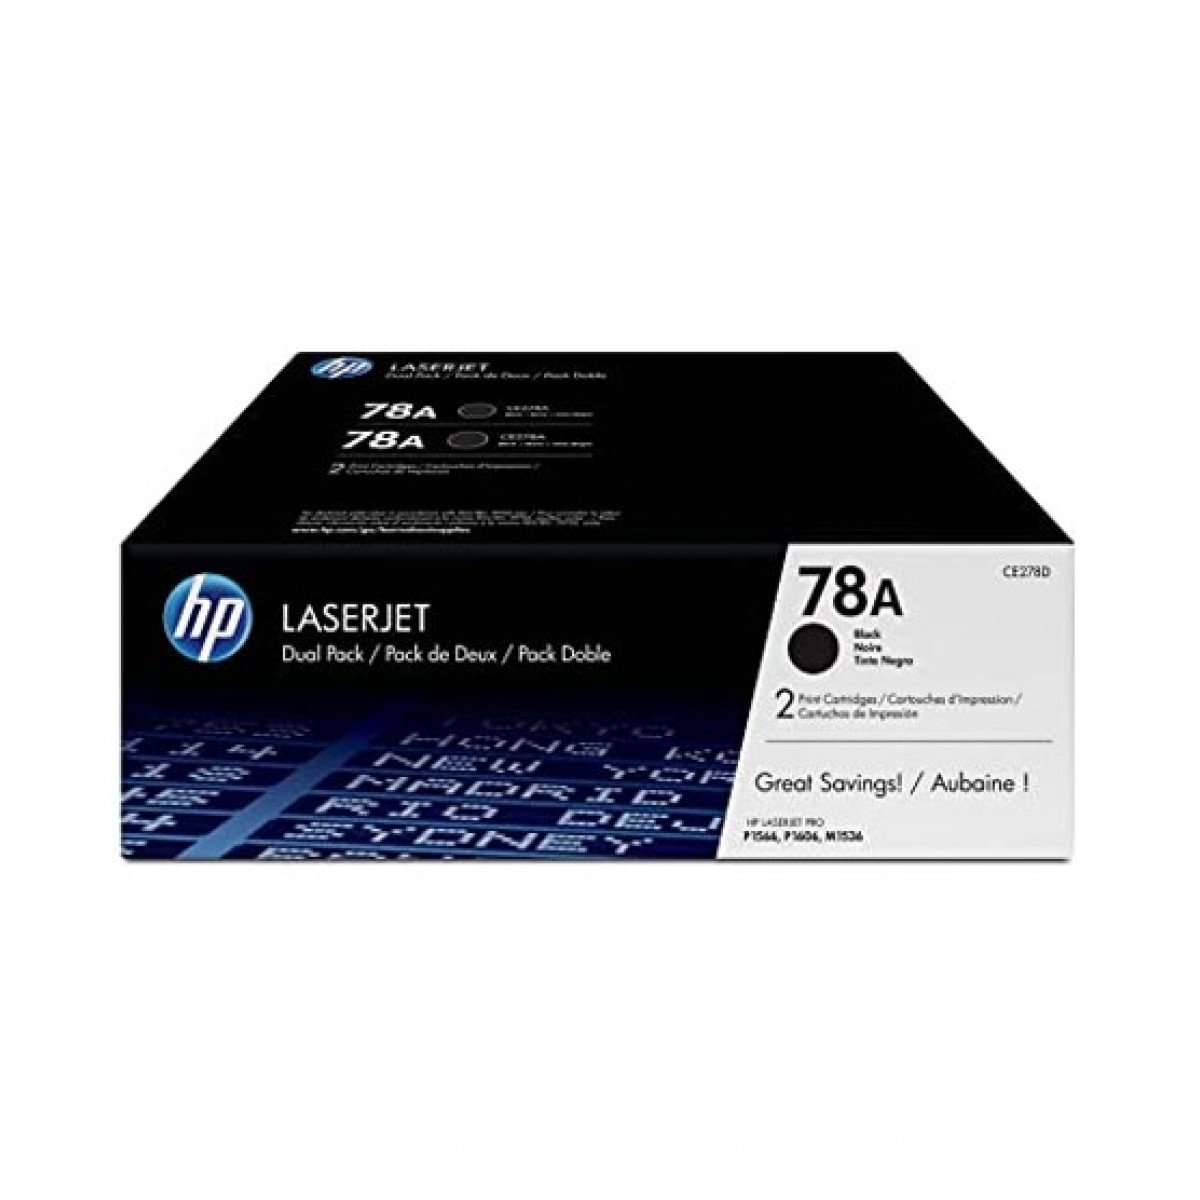 HP 78A LaserJet Toner Cartridge Black (CE278AD)